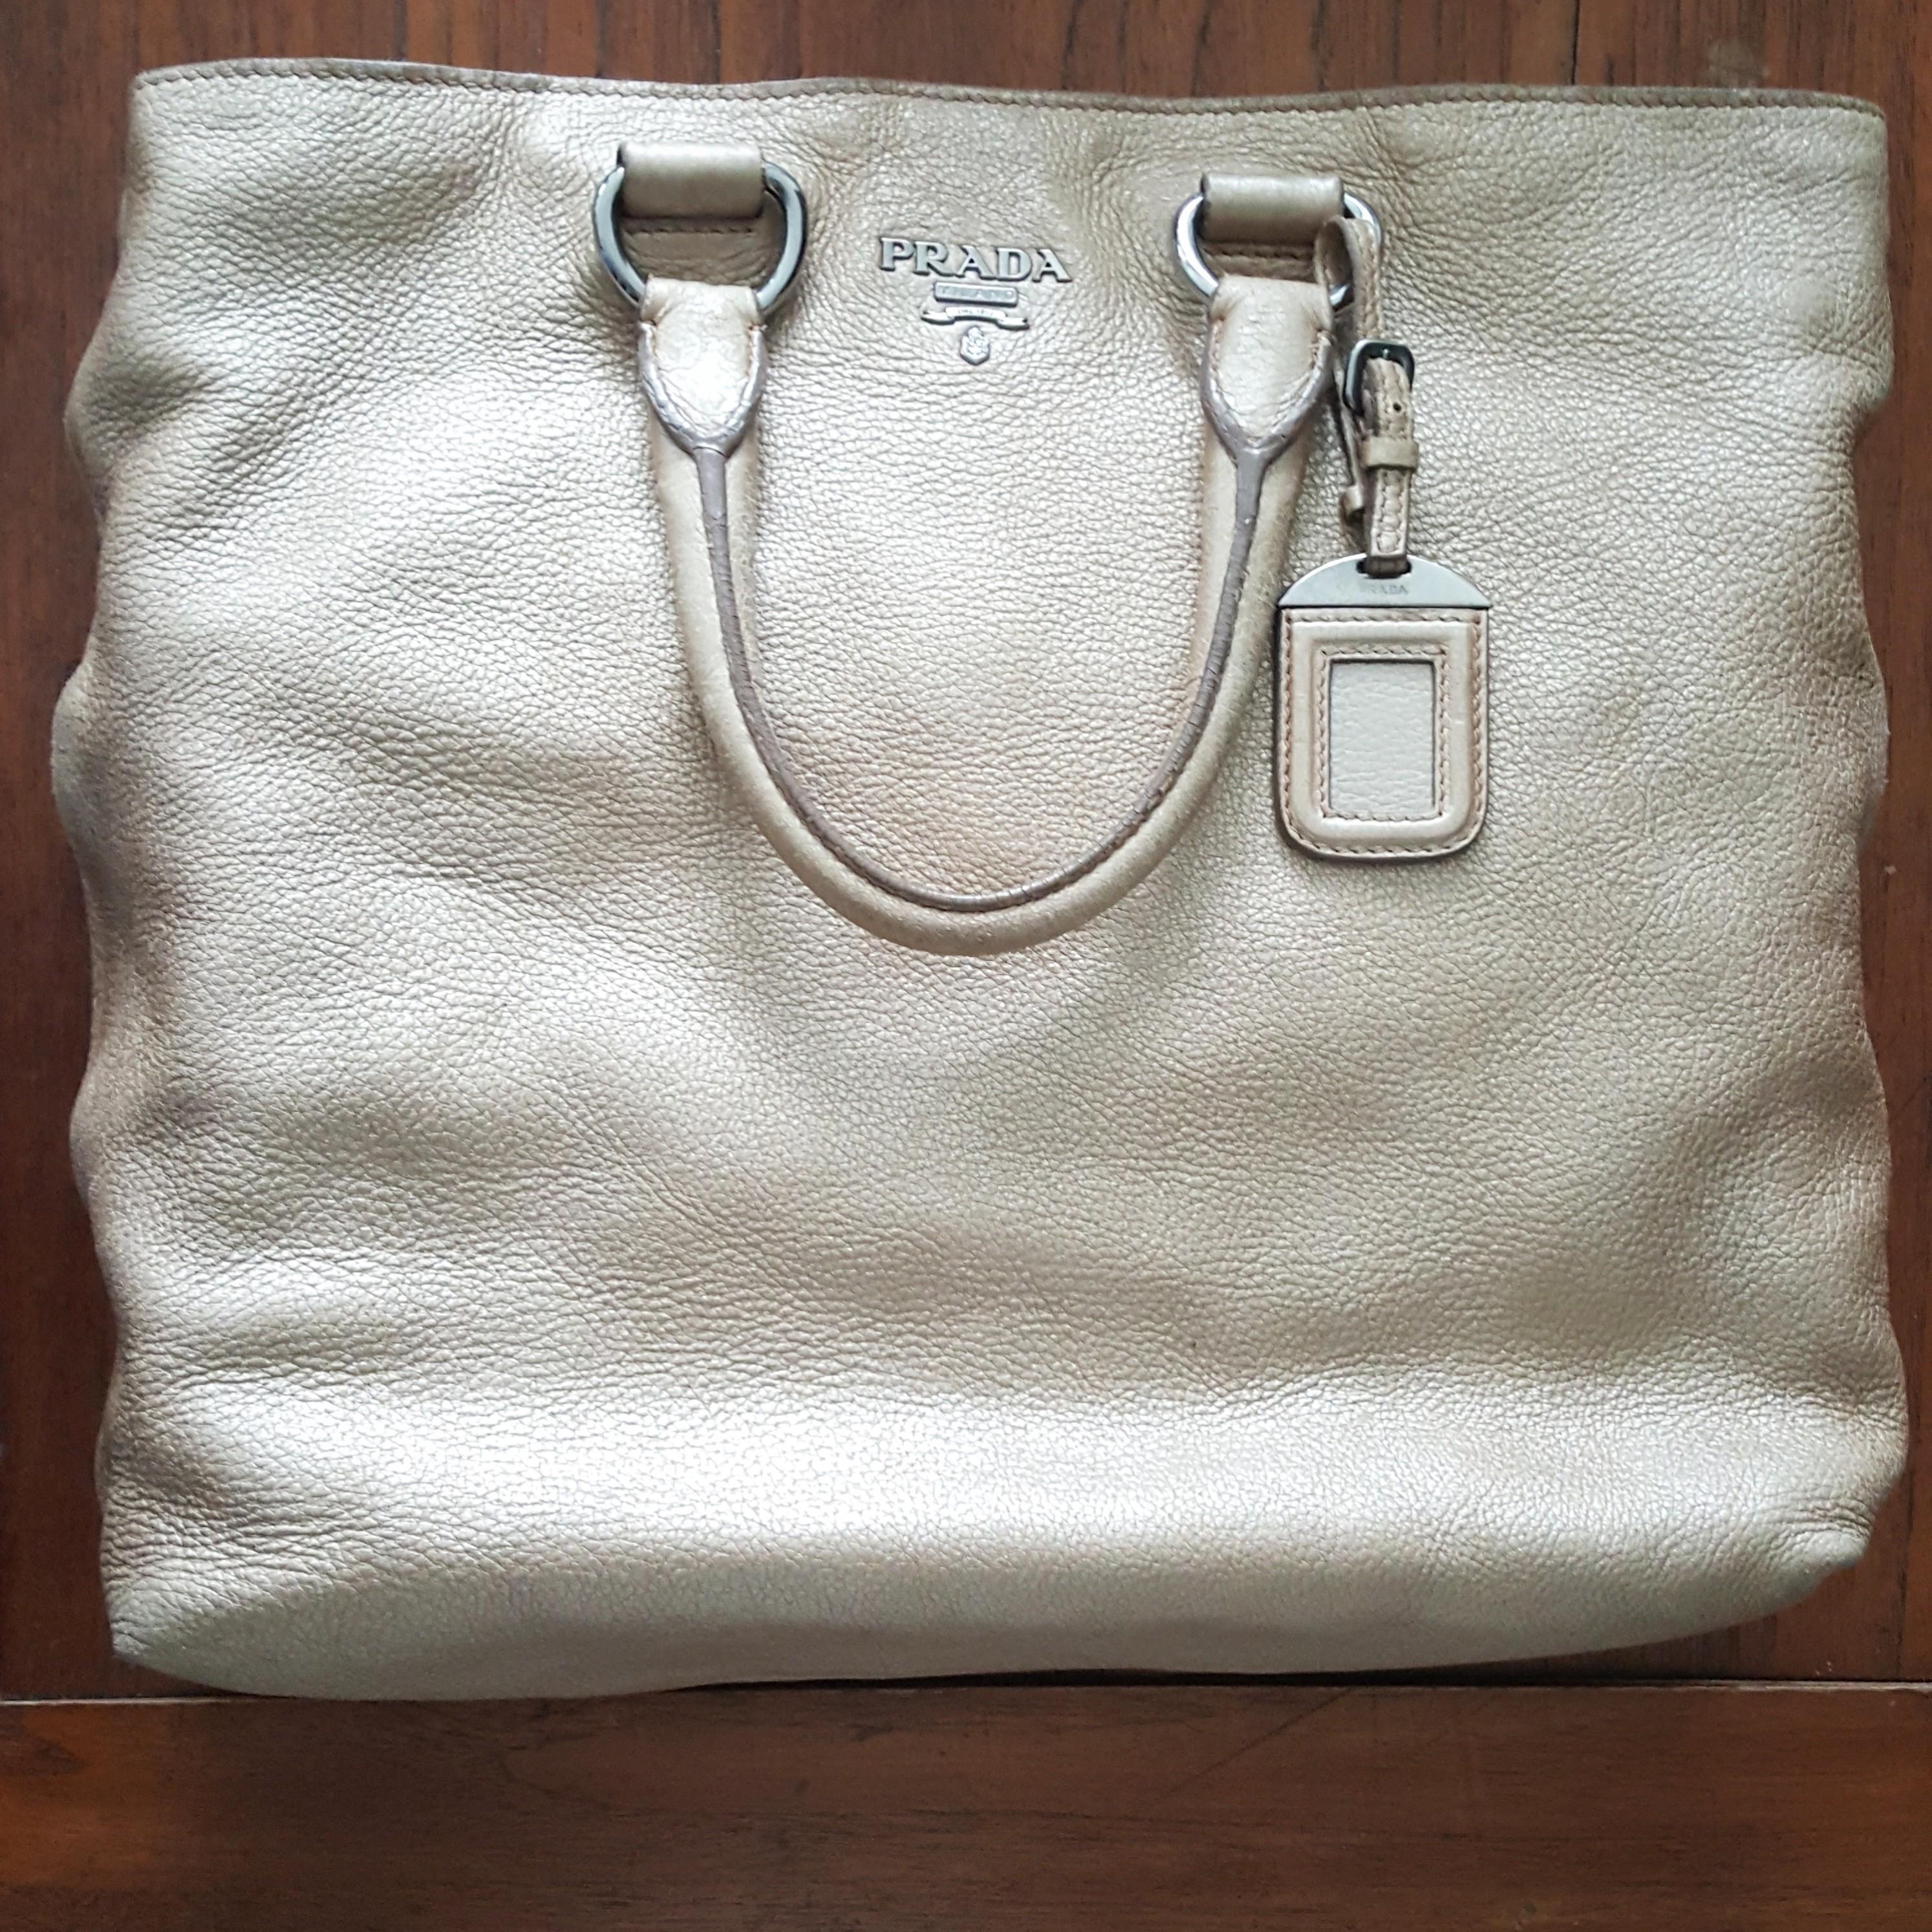 085a61bd4d62 Home · Luxury · Bags   Wallets · Handbags. photo photo ...